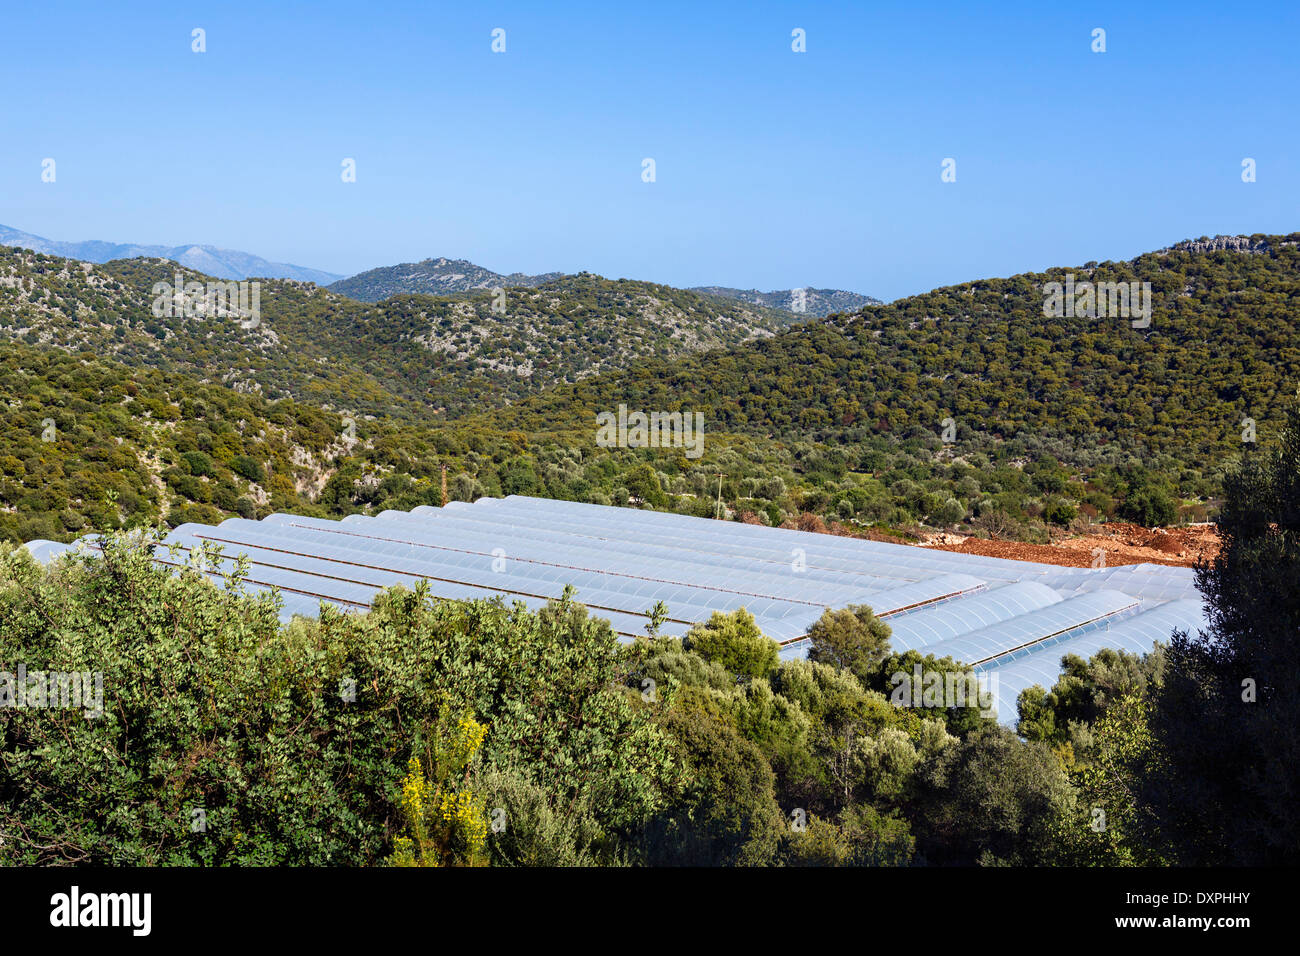 Polytunnels in the countryside near Demre, Antalya Province, Turkey - Stock Image